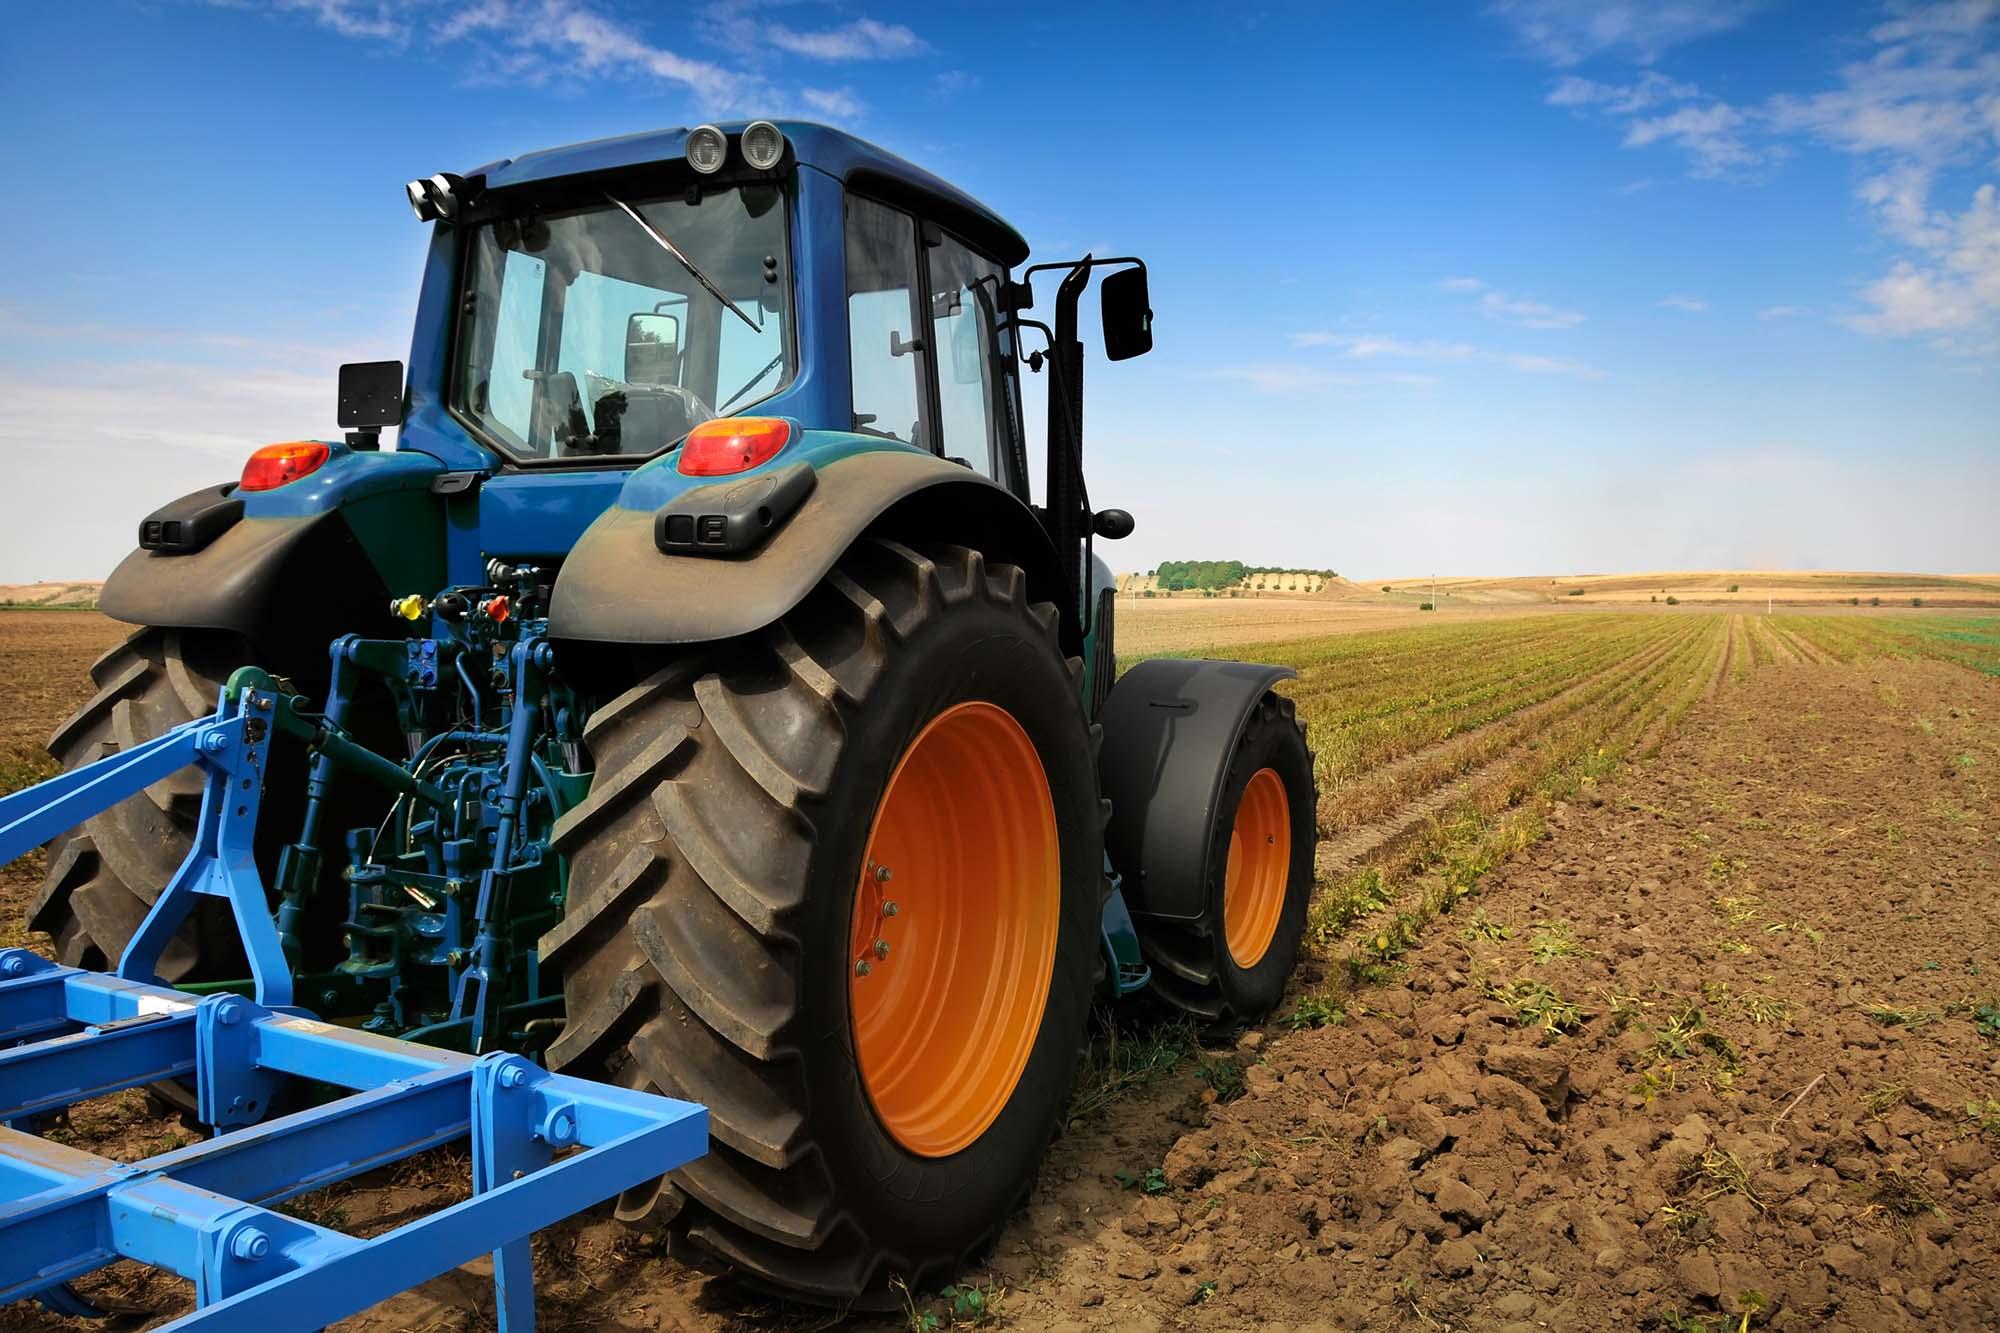 Blue tractor in muddy field